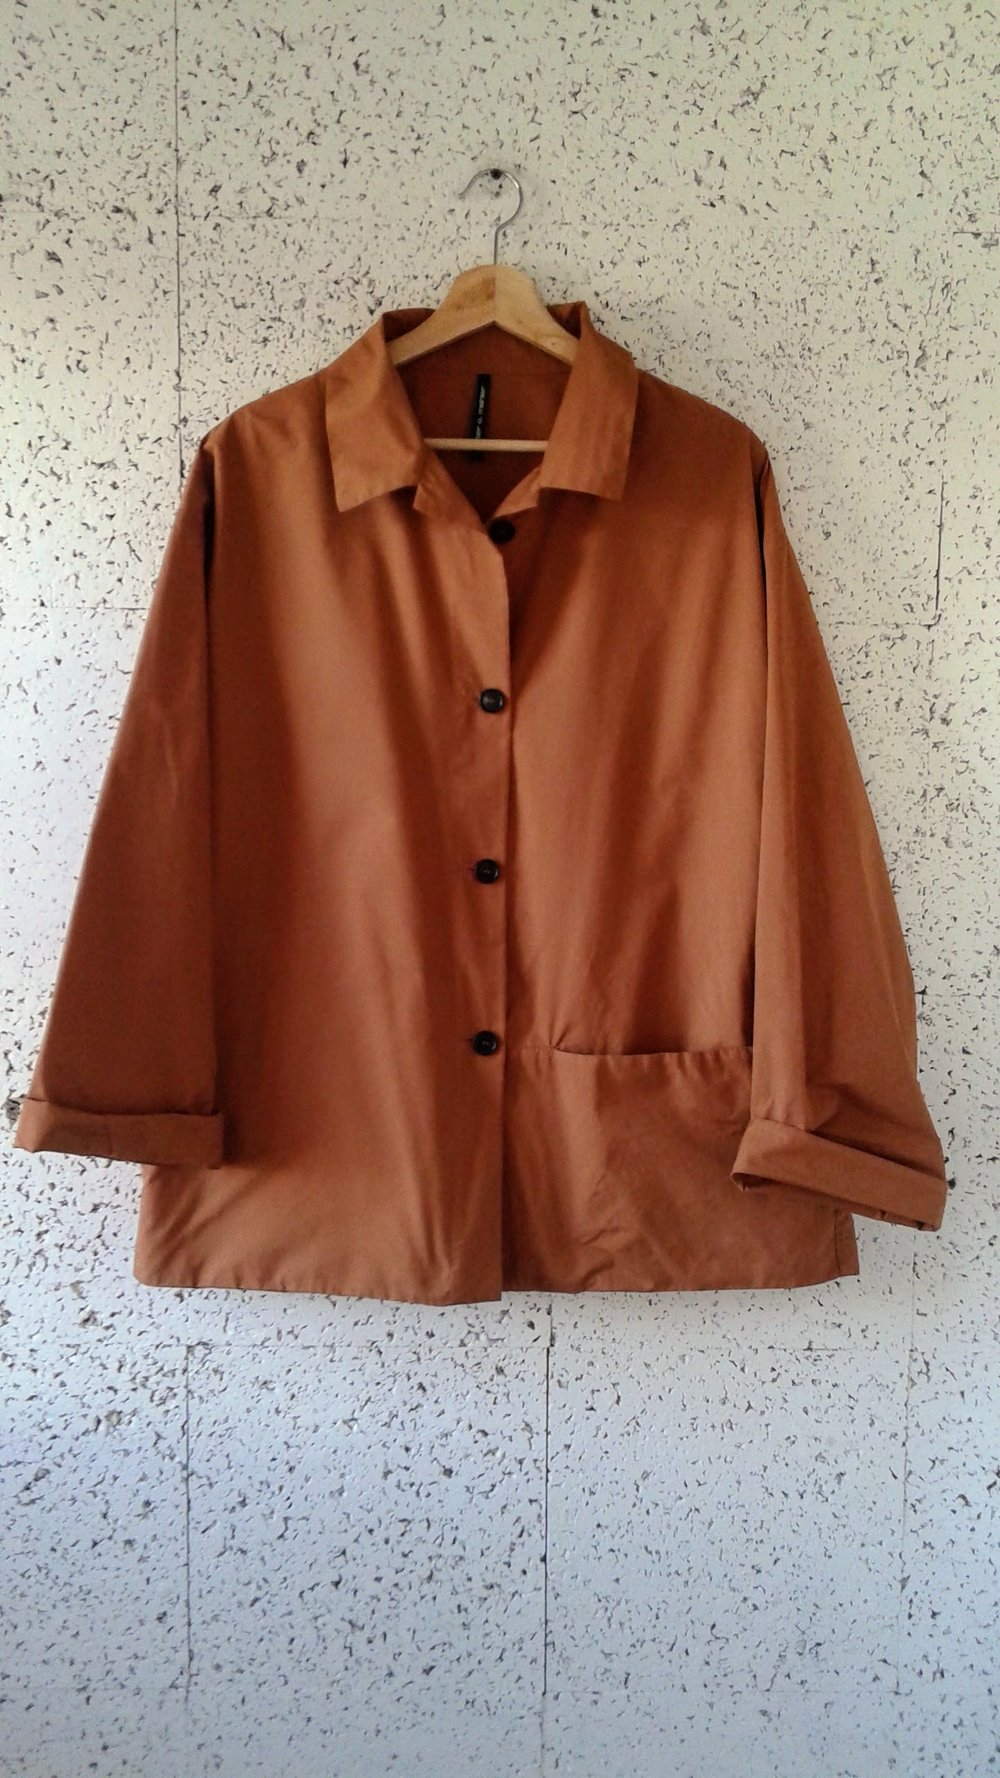 Peter O. Mahler coat; Size L, $110